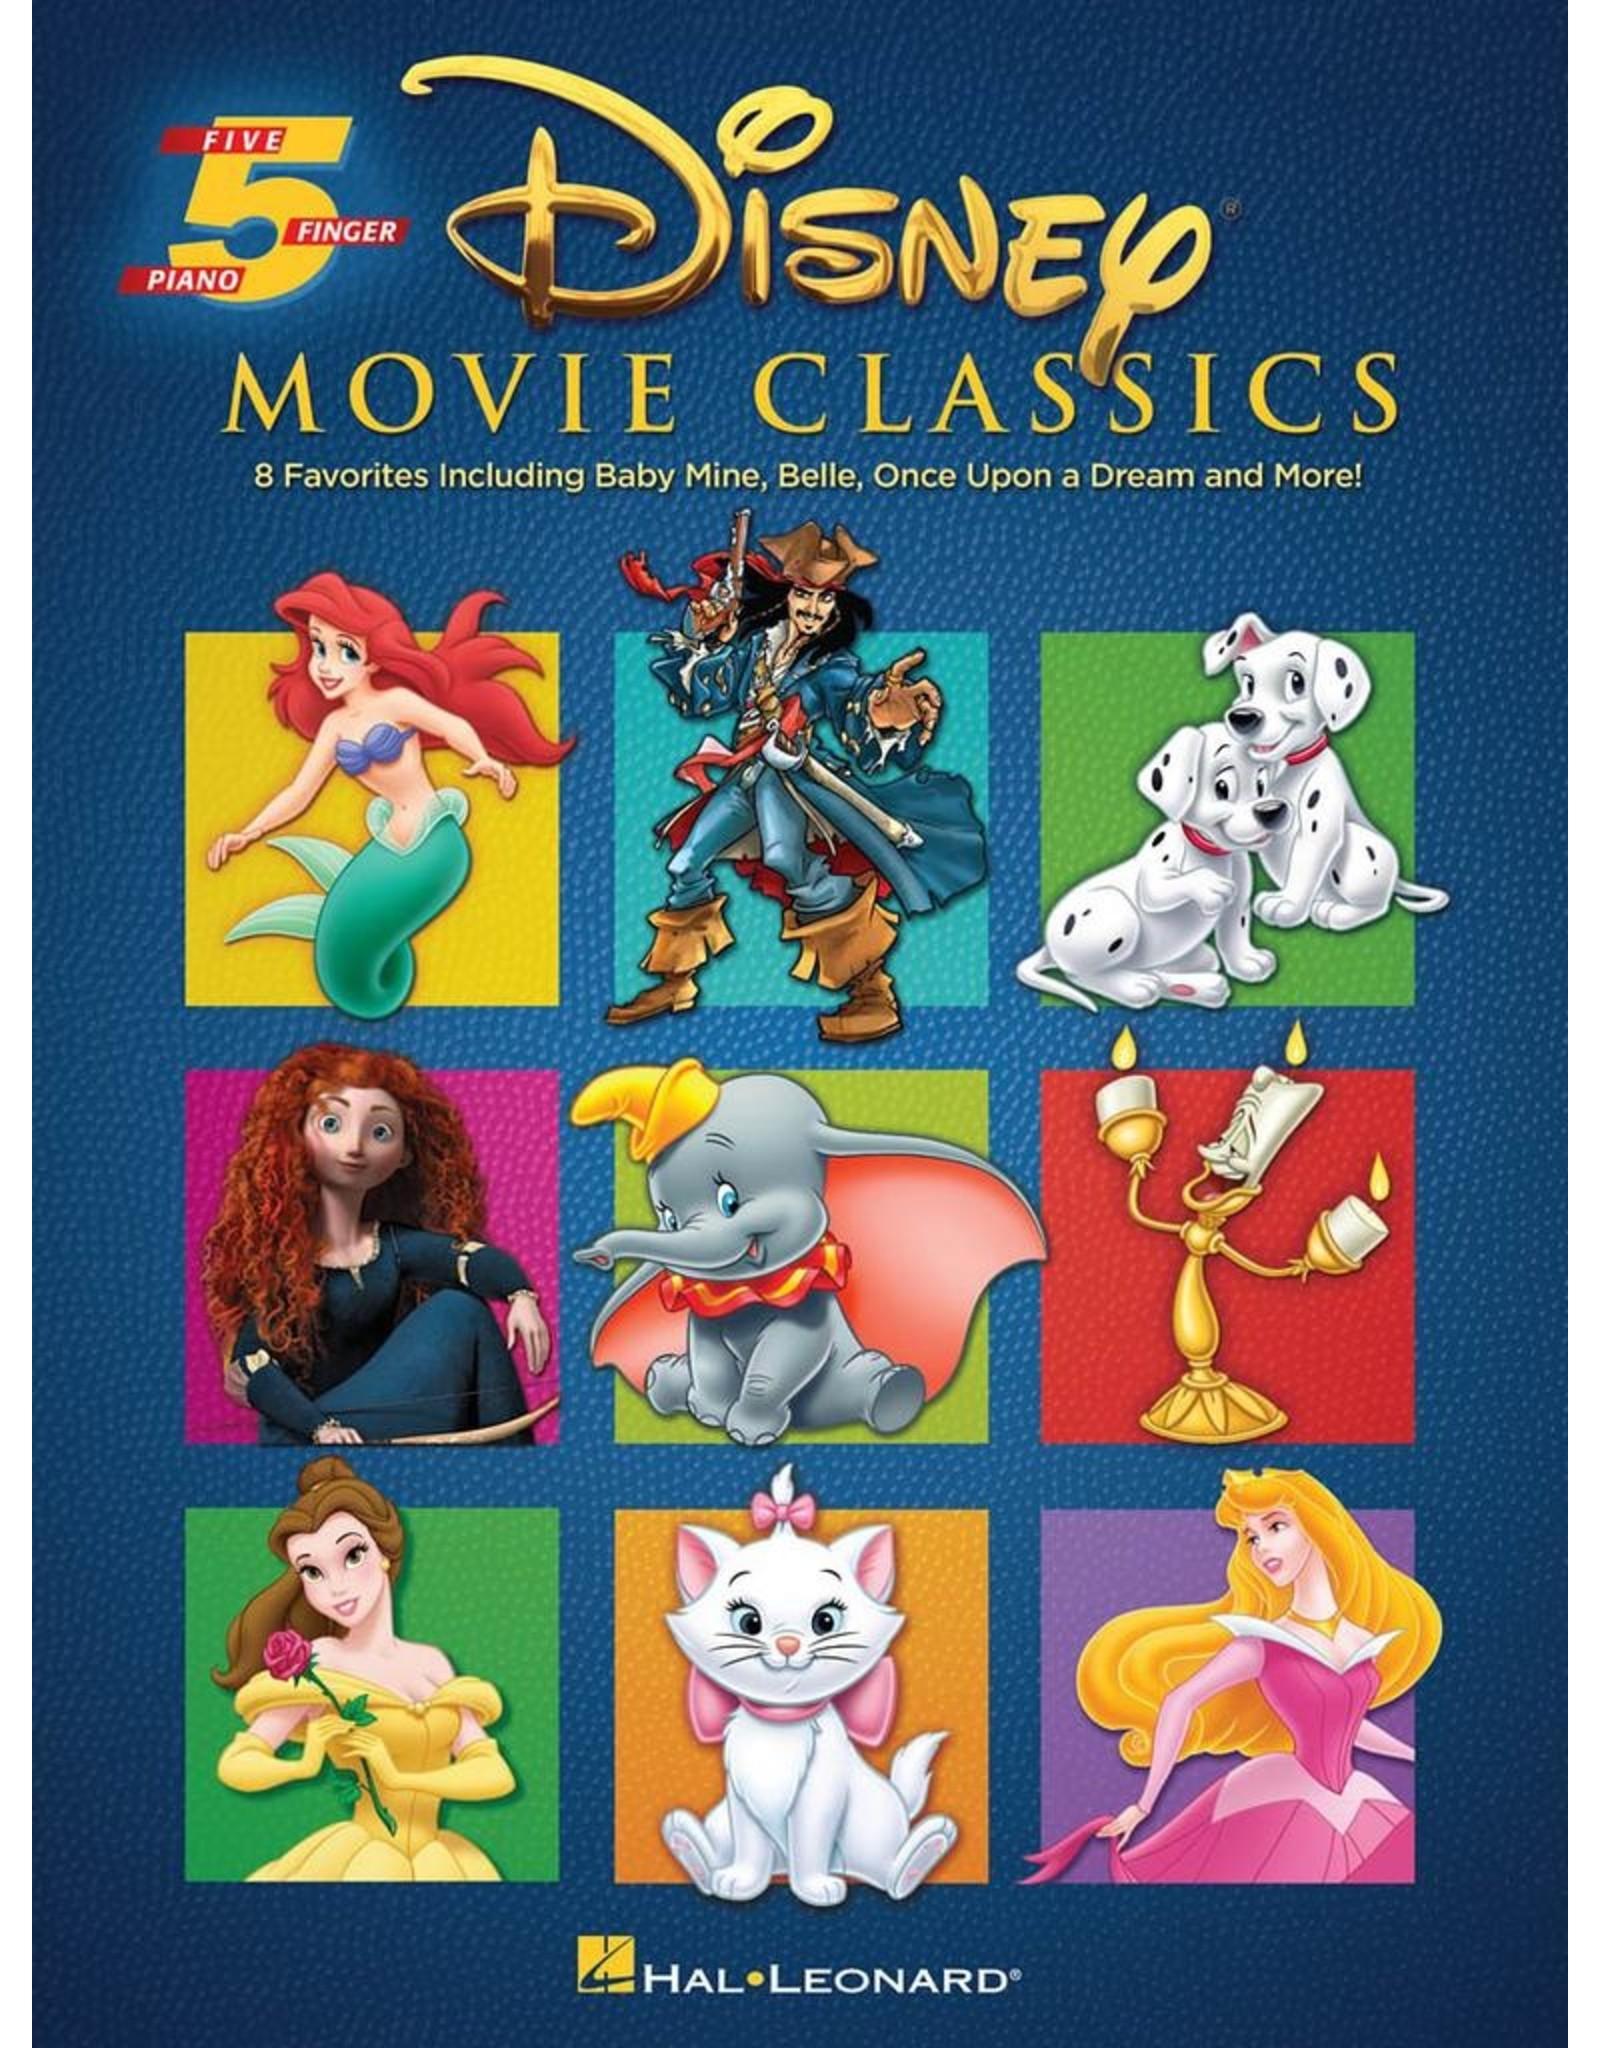 Hal Leonard Disney Movie Classics 5 Finger